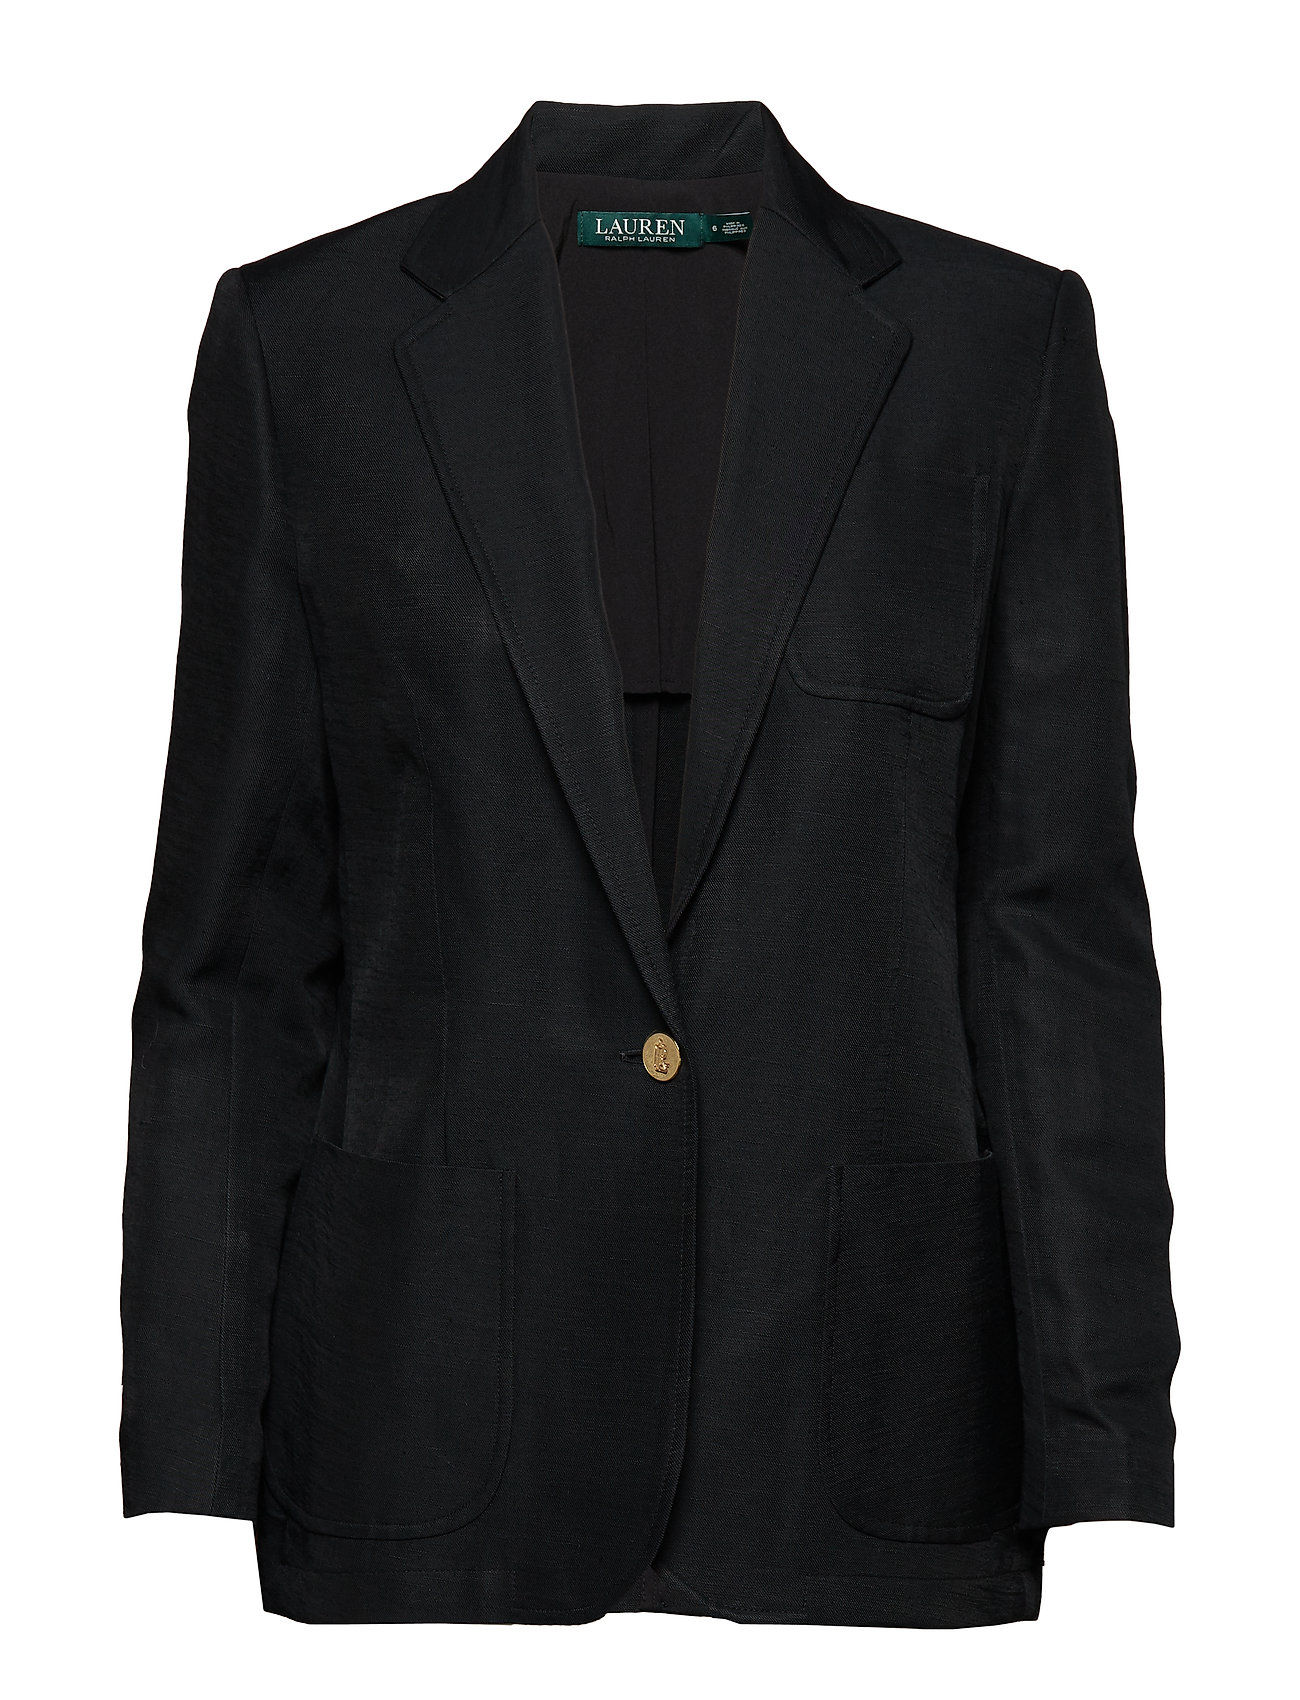 Lauren Ralph Lauren Linen-Blend Twill Blazer - POLO BLACK